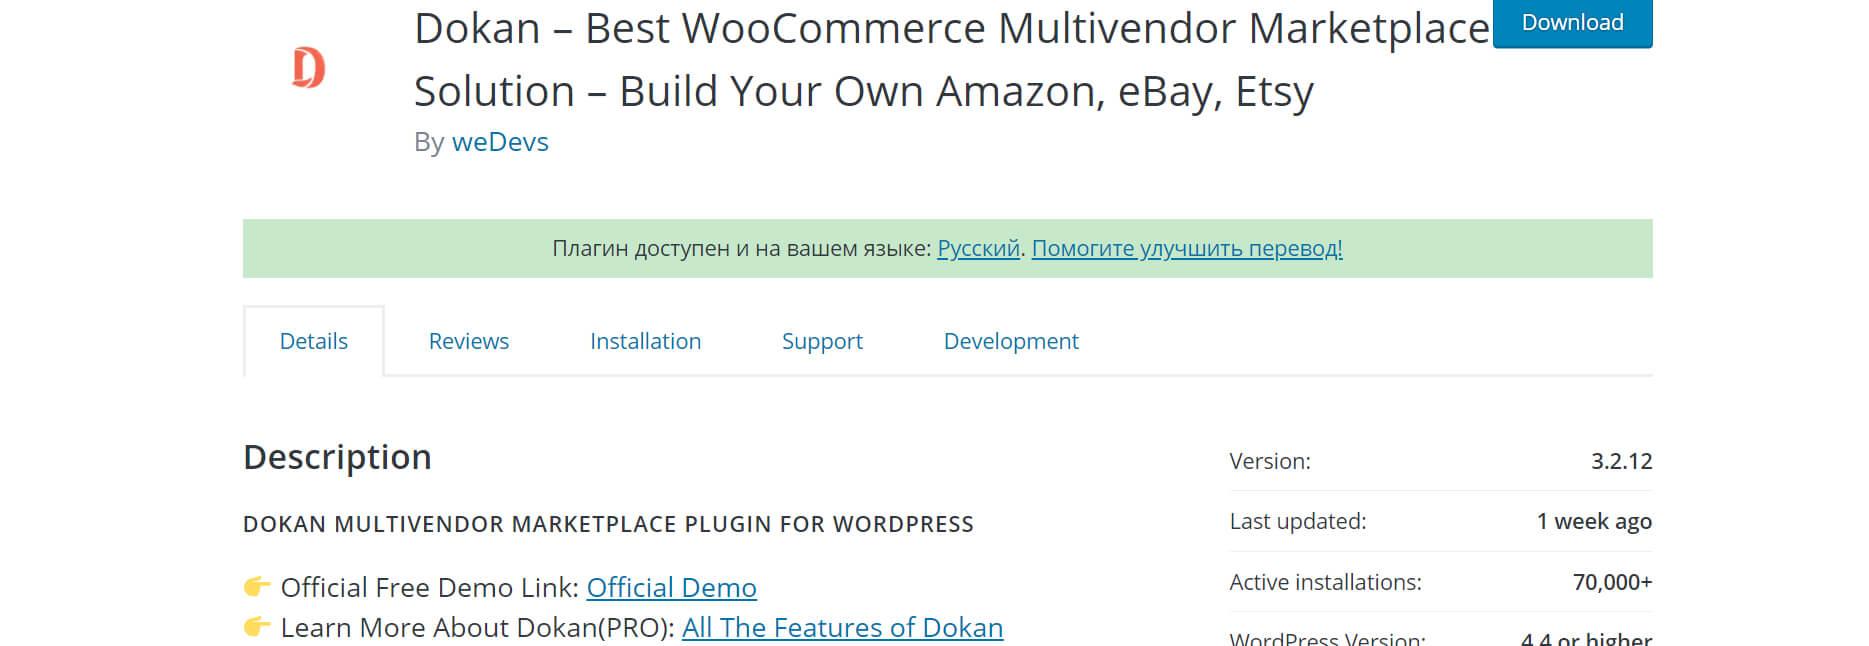 Dokan WooCommerce Multivendor Marketplace